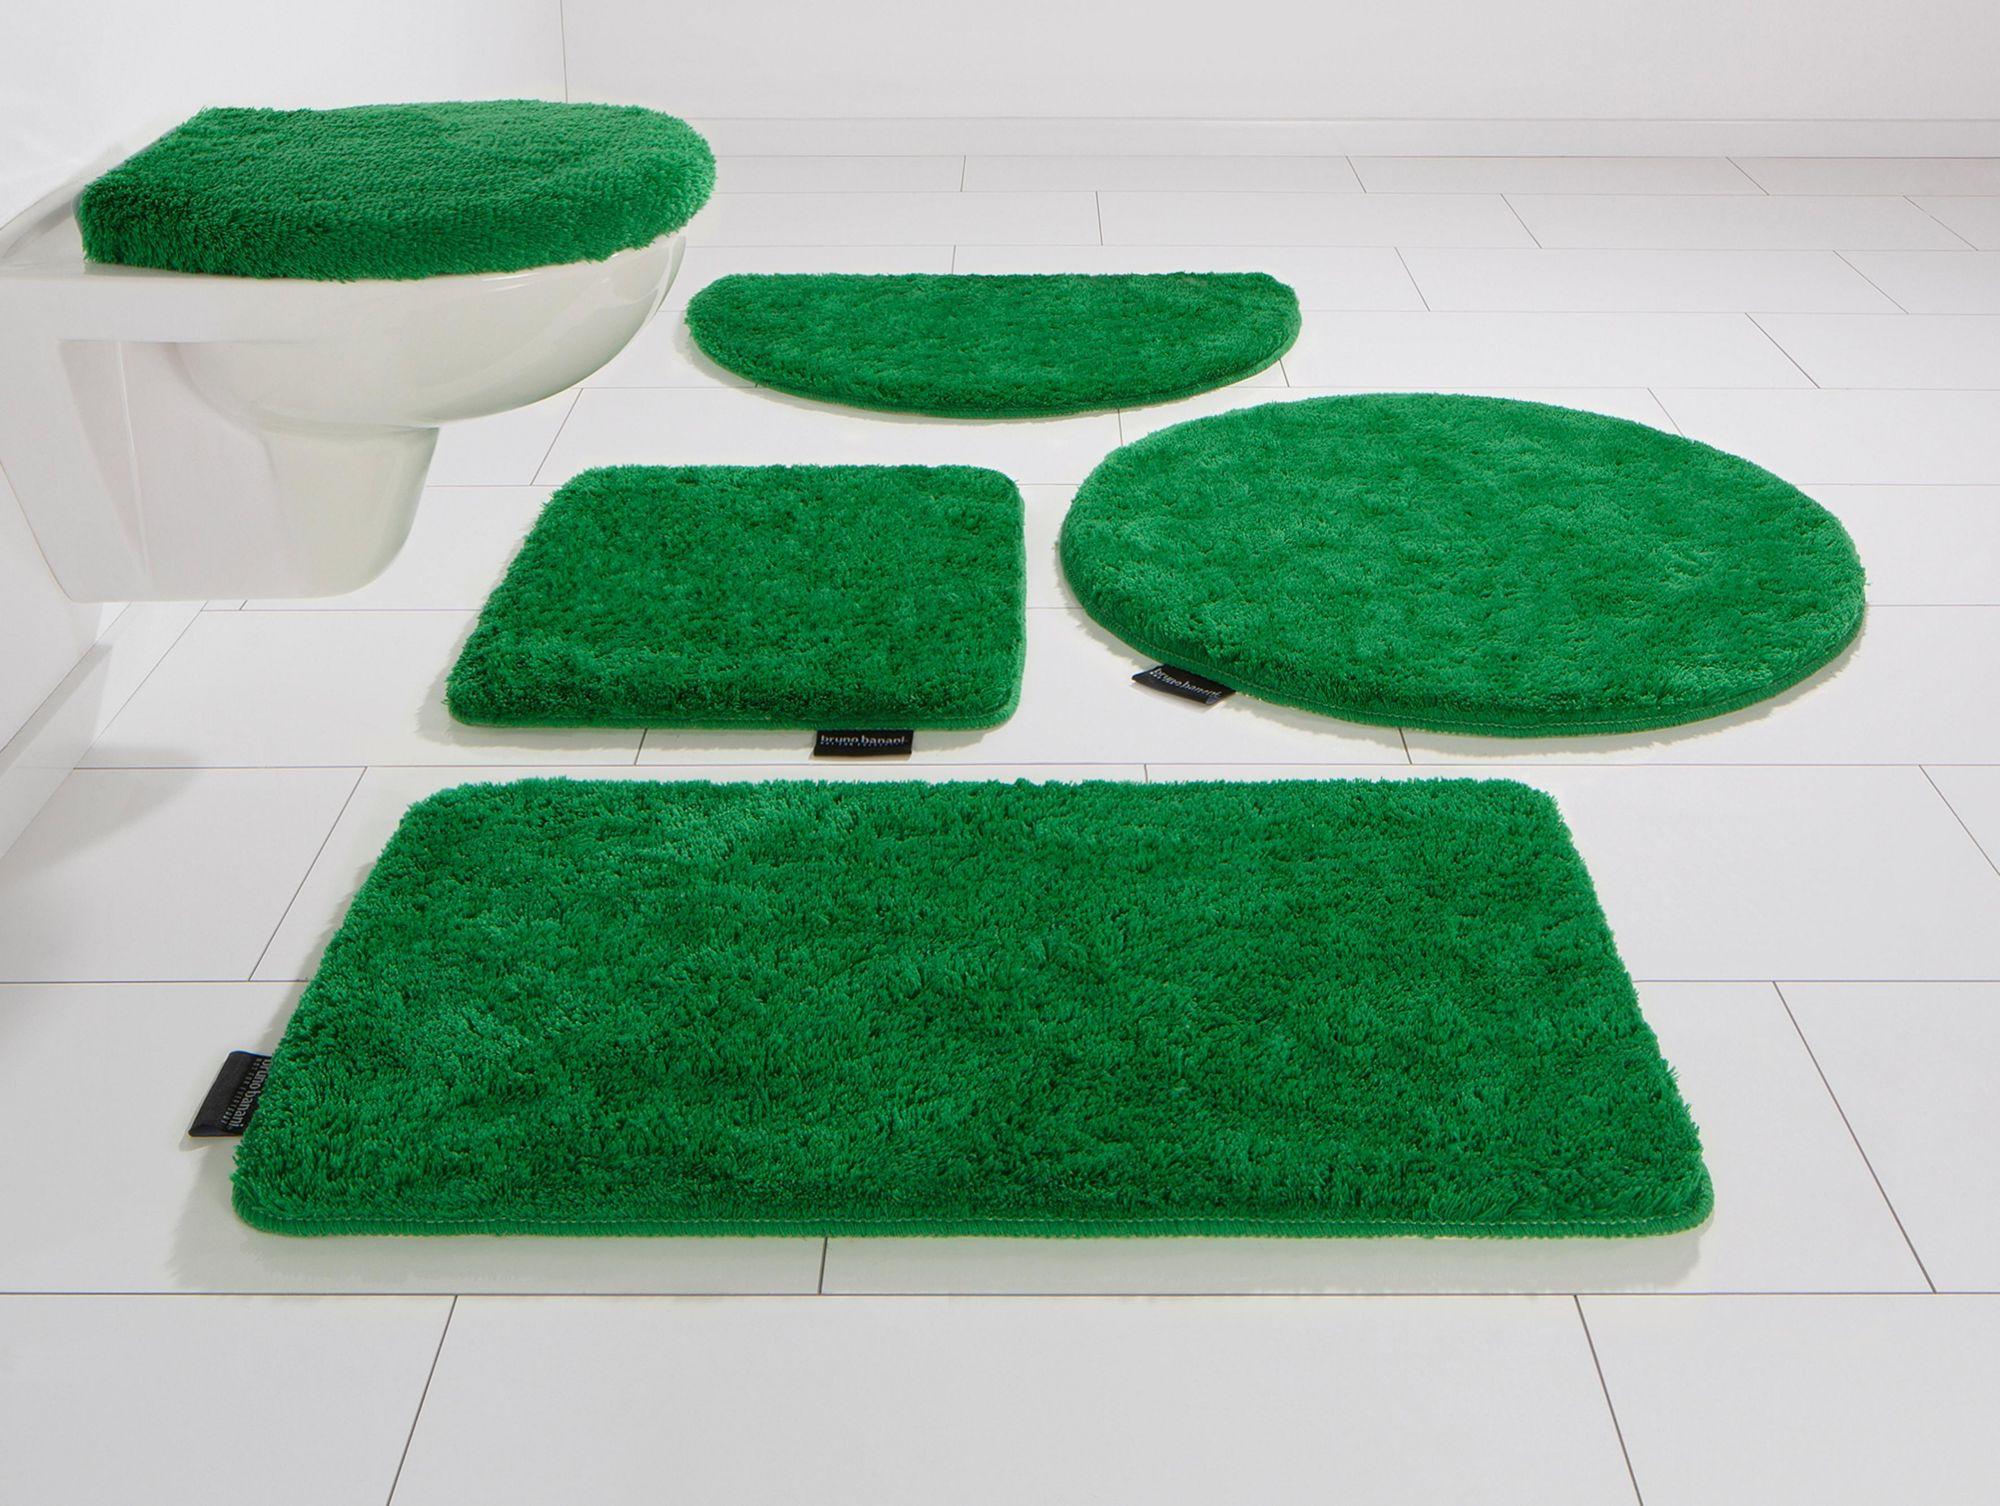 BRUNO BANANI Badematte, 3 tlg. Stand WC-Set, Bruno Banani, »Lana«, Höhe 25 mm, rutschhemmender Rücken